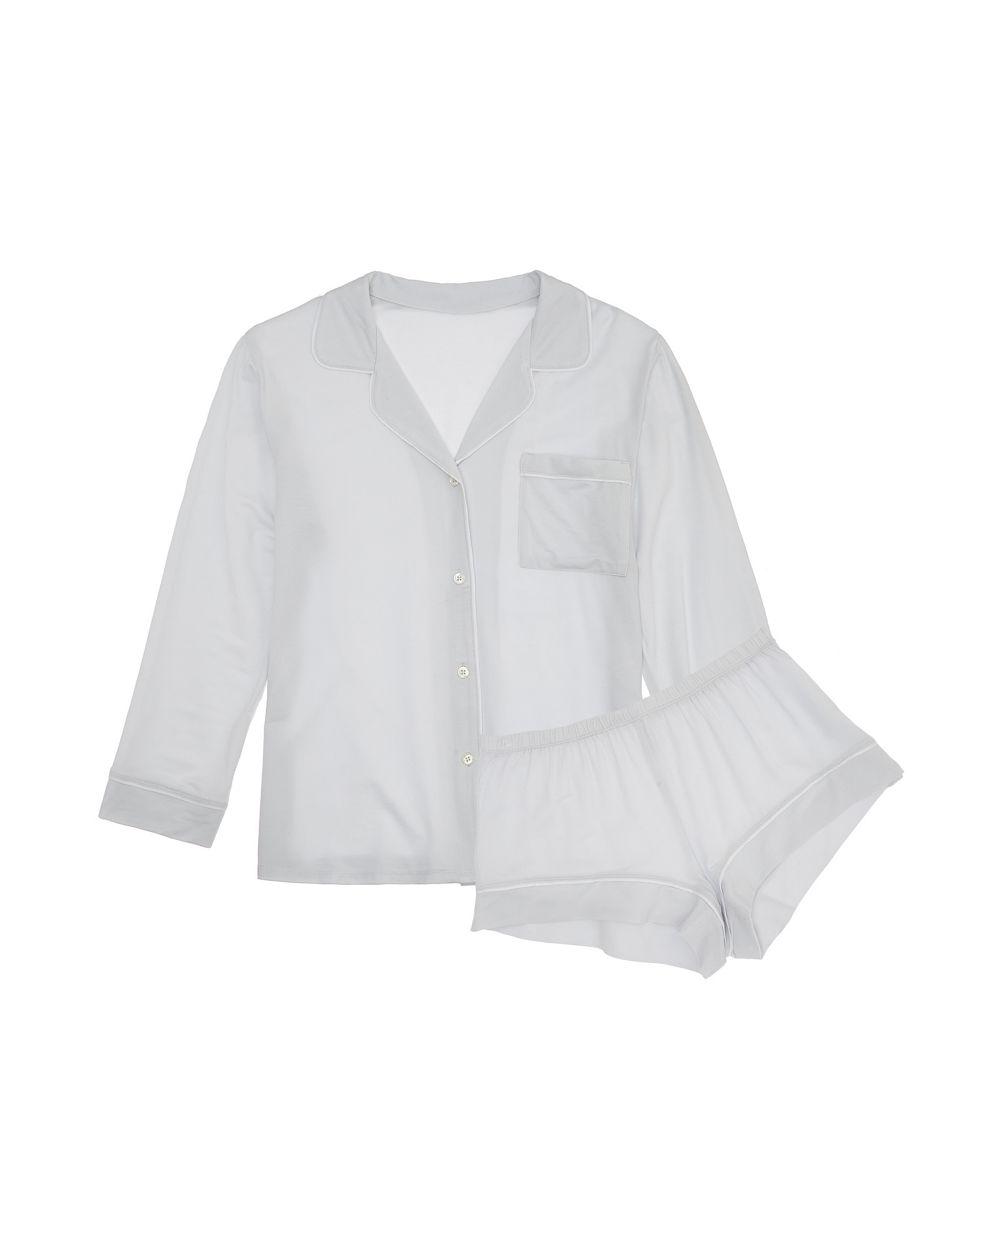 Gisele Long Sleeve/Short Pj Set by Eberjey